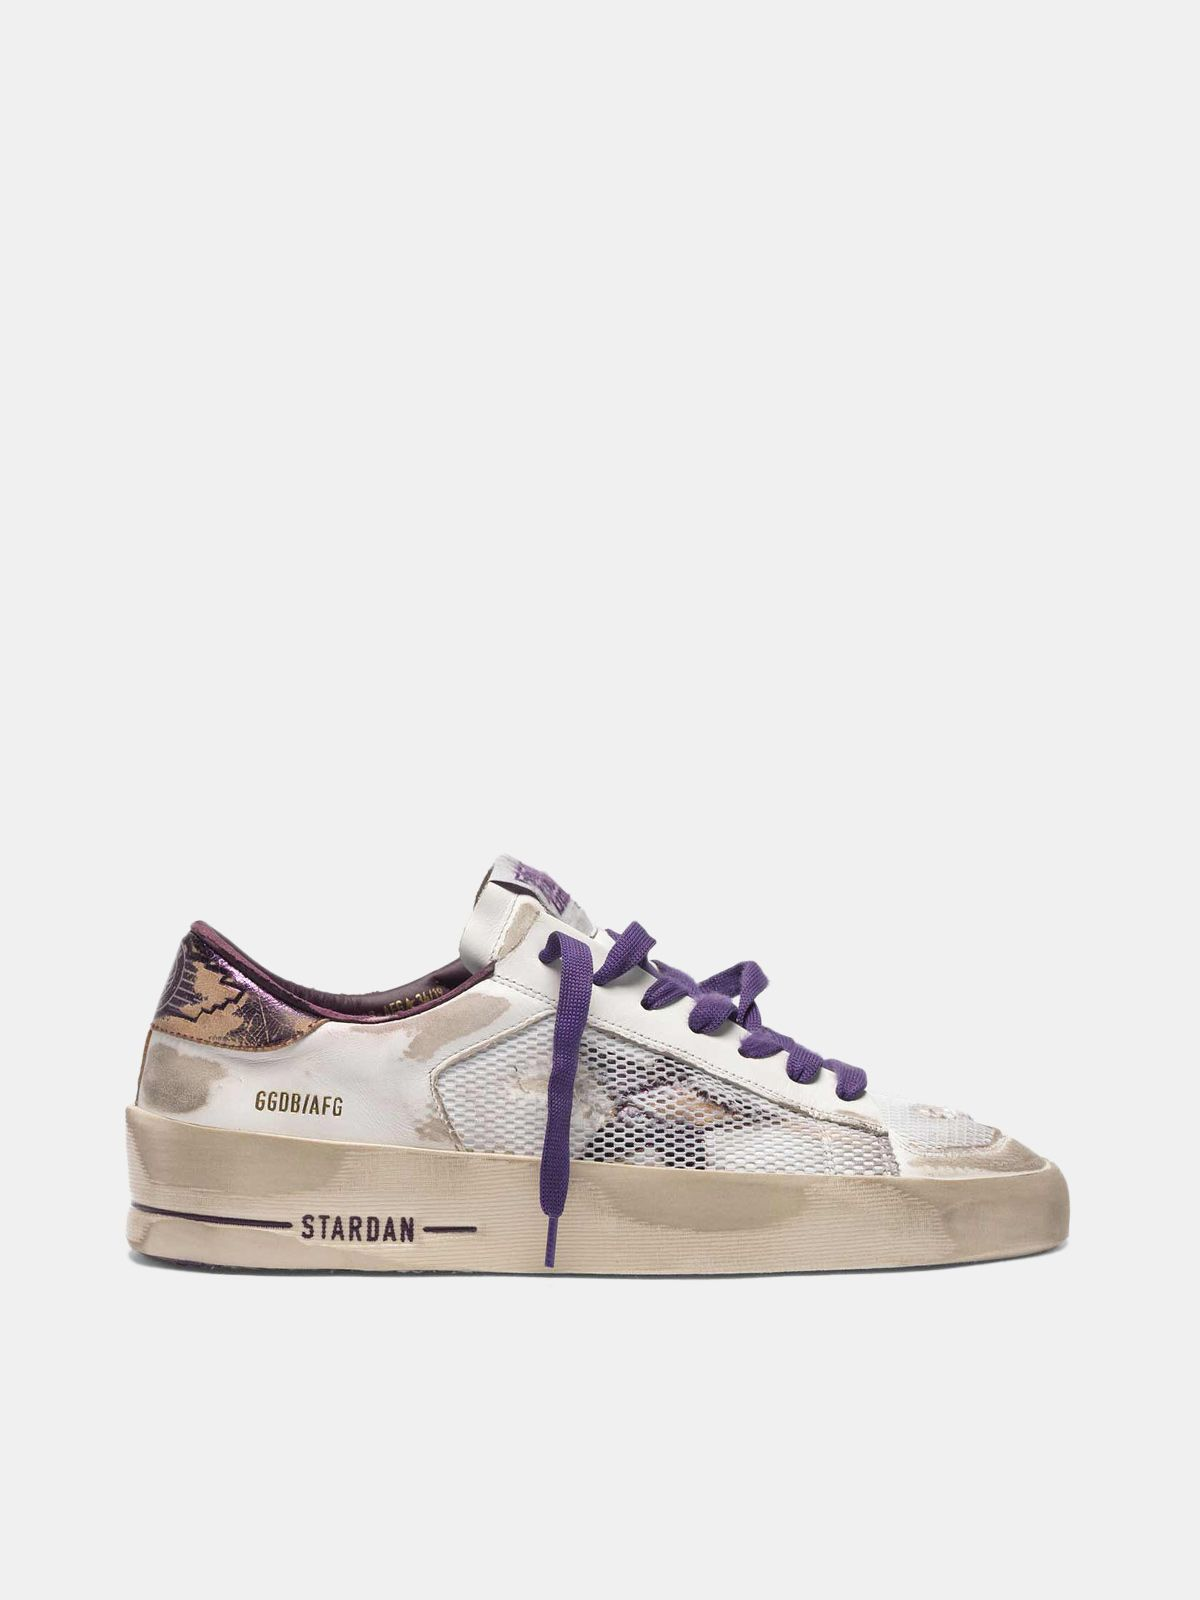 Golden Goose - Sneakers Stardan LTD white&purple distressed  in